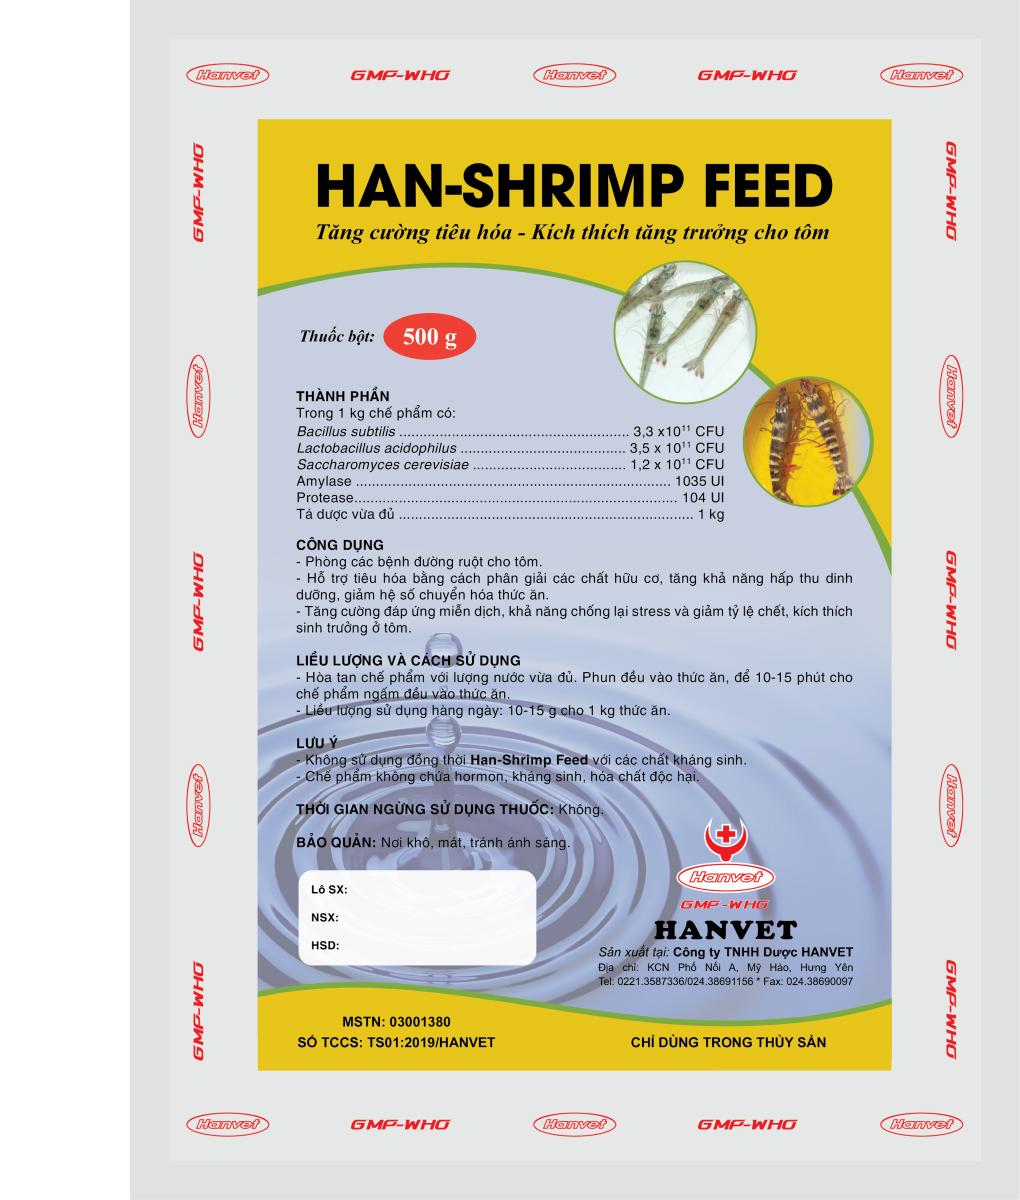 HAN-SHRIMP FEED